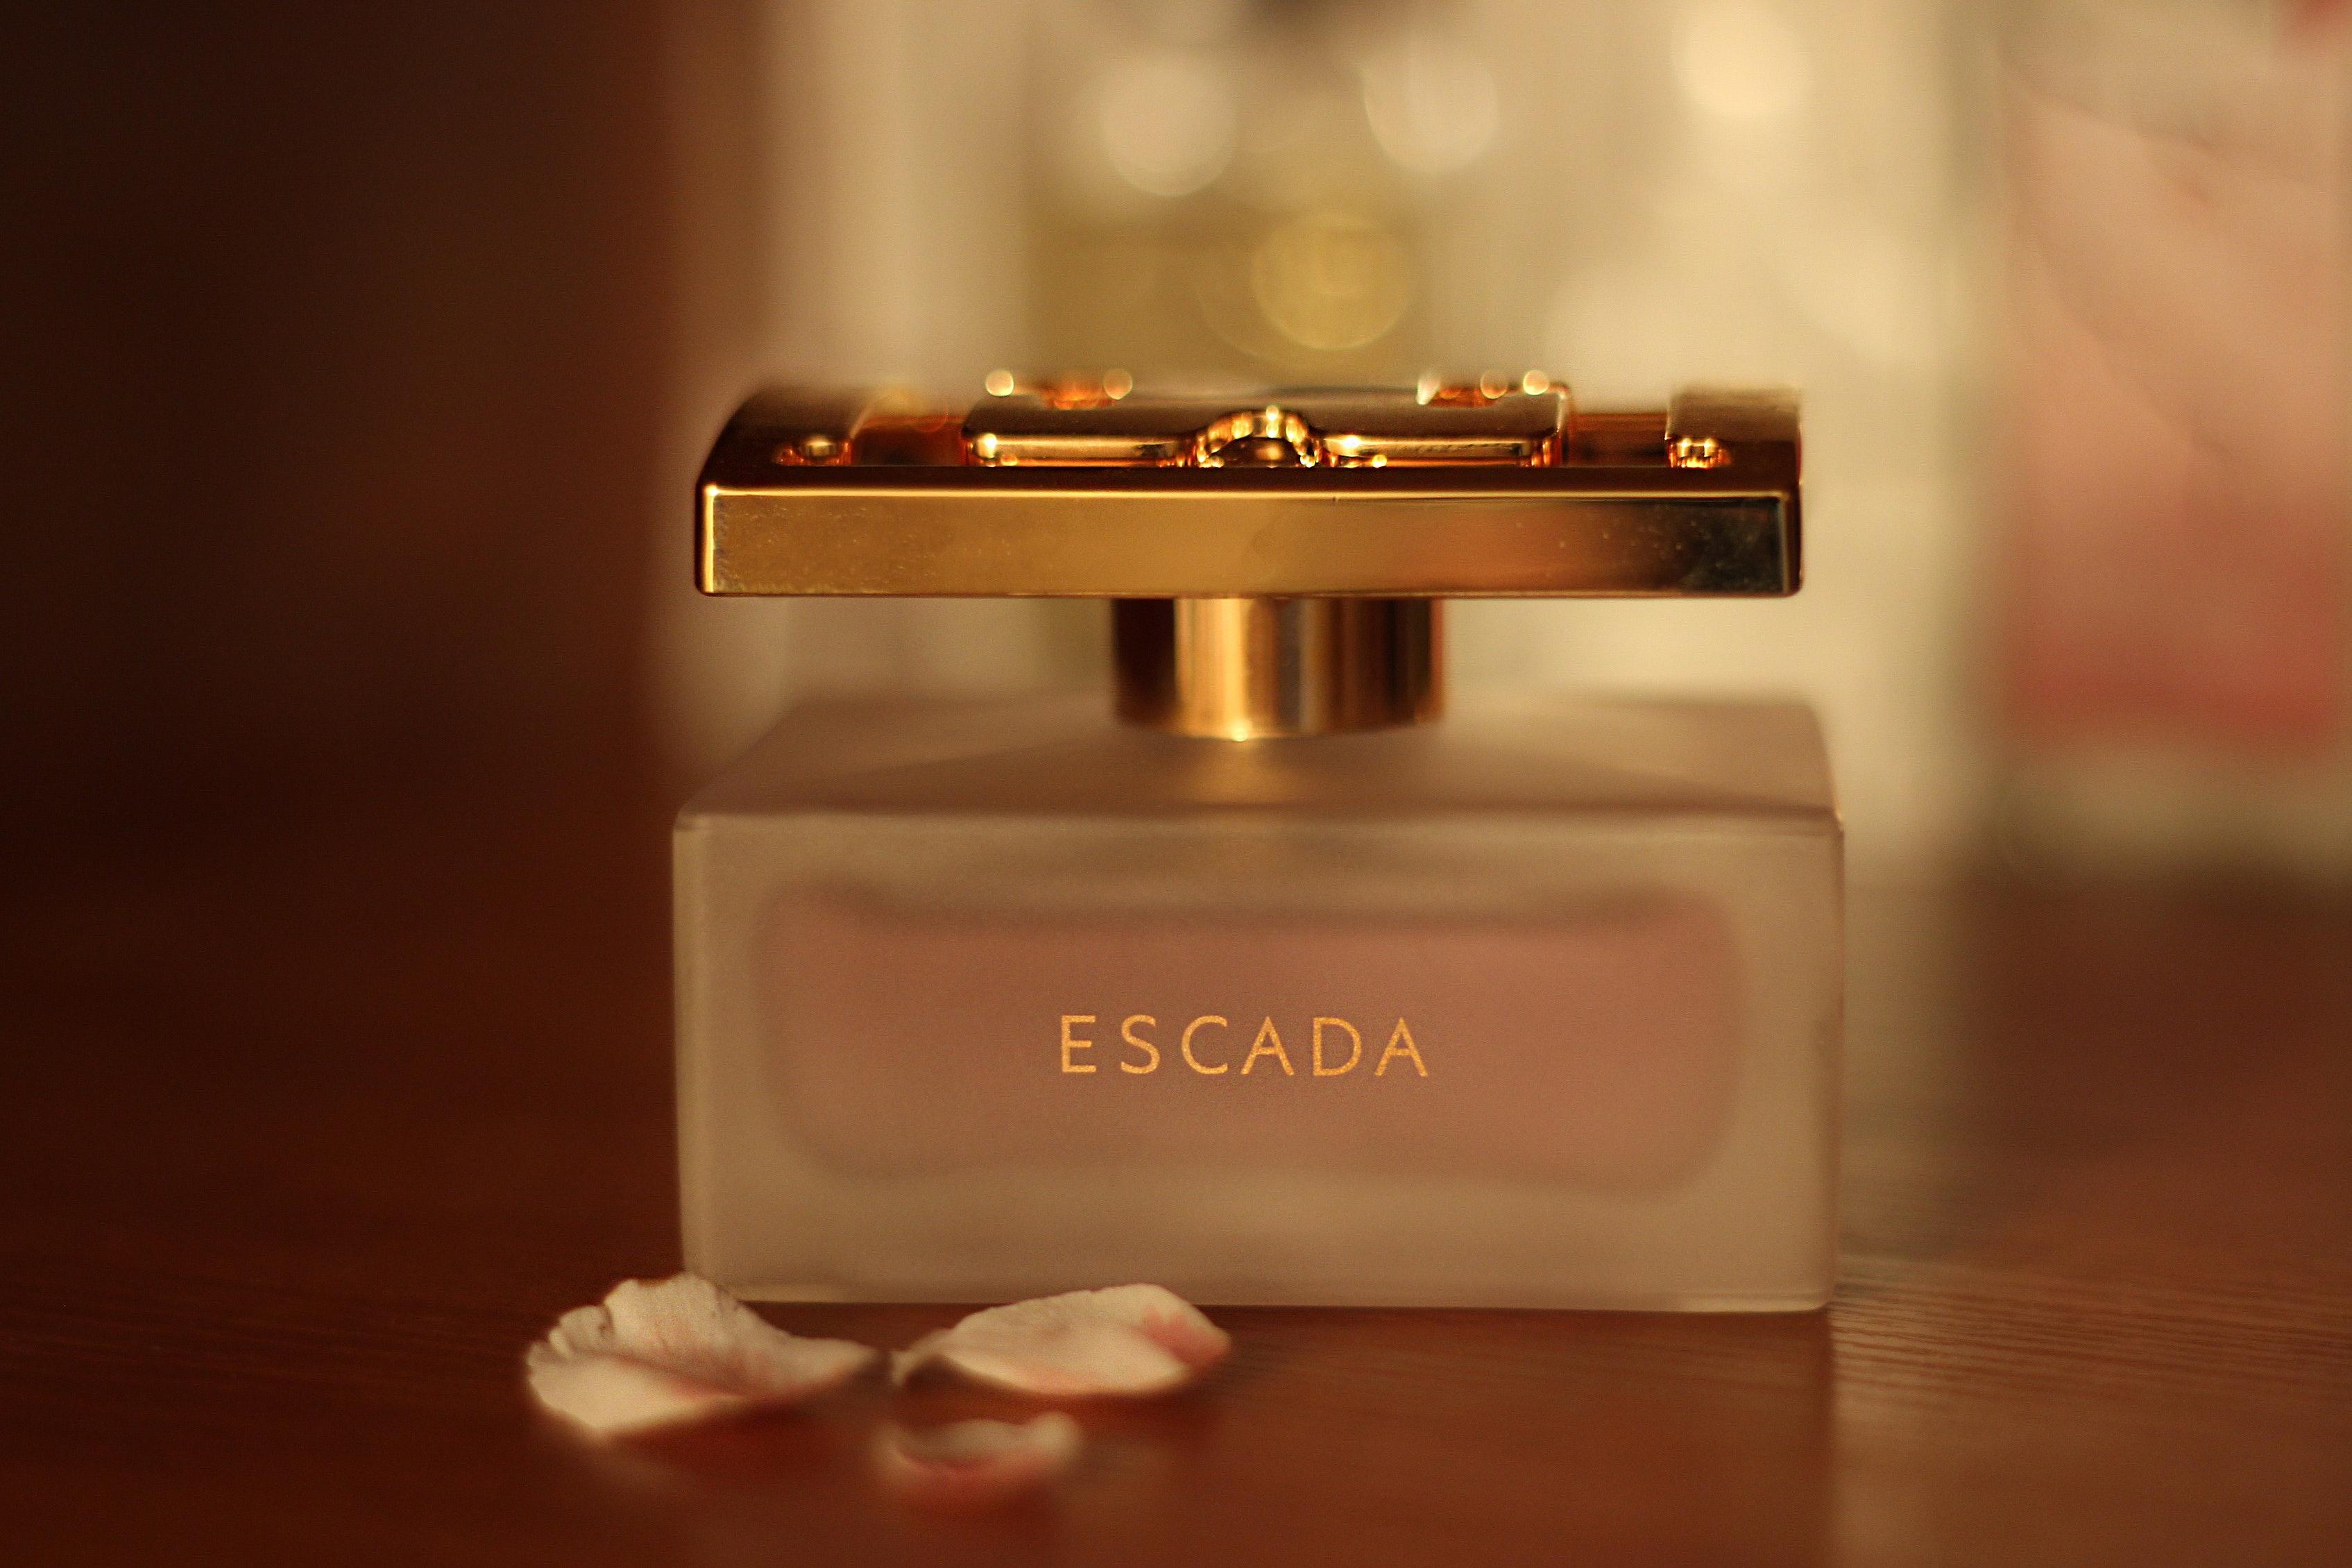 Escada perfume bottle on table photo